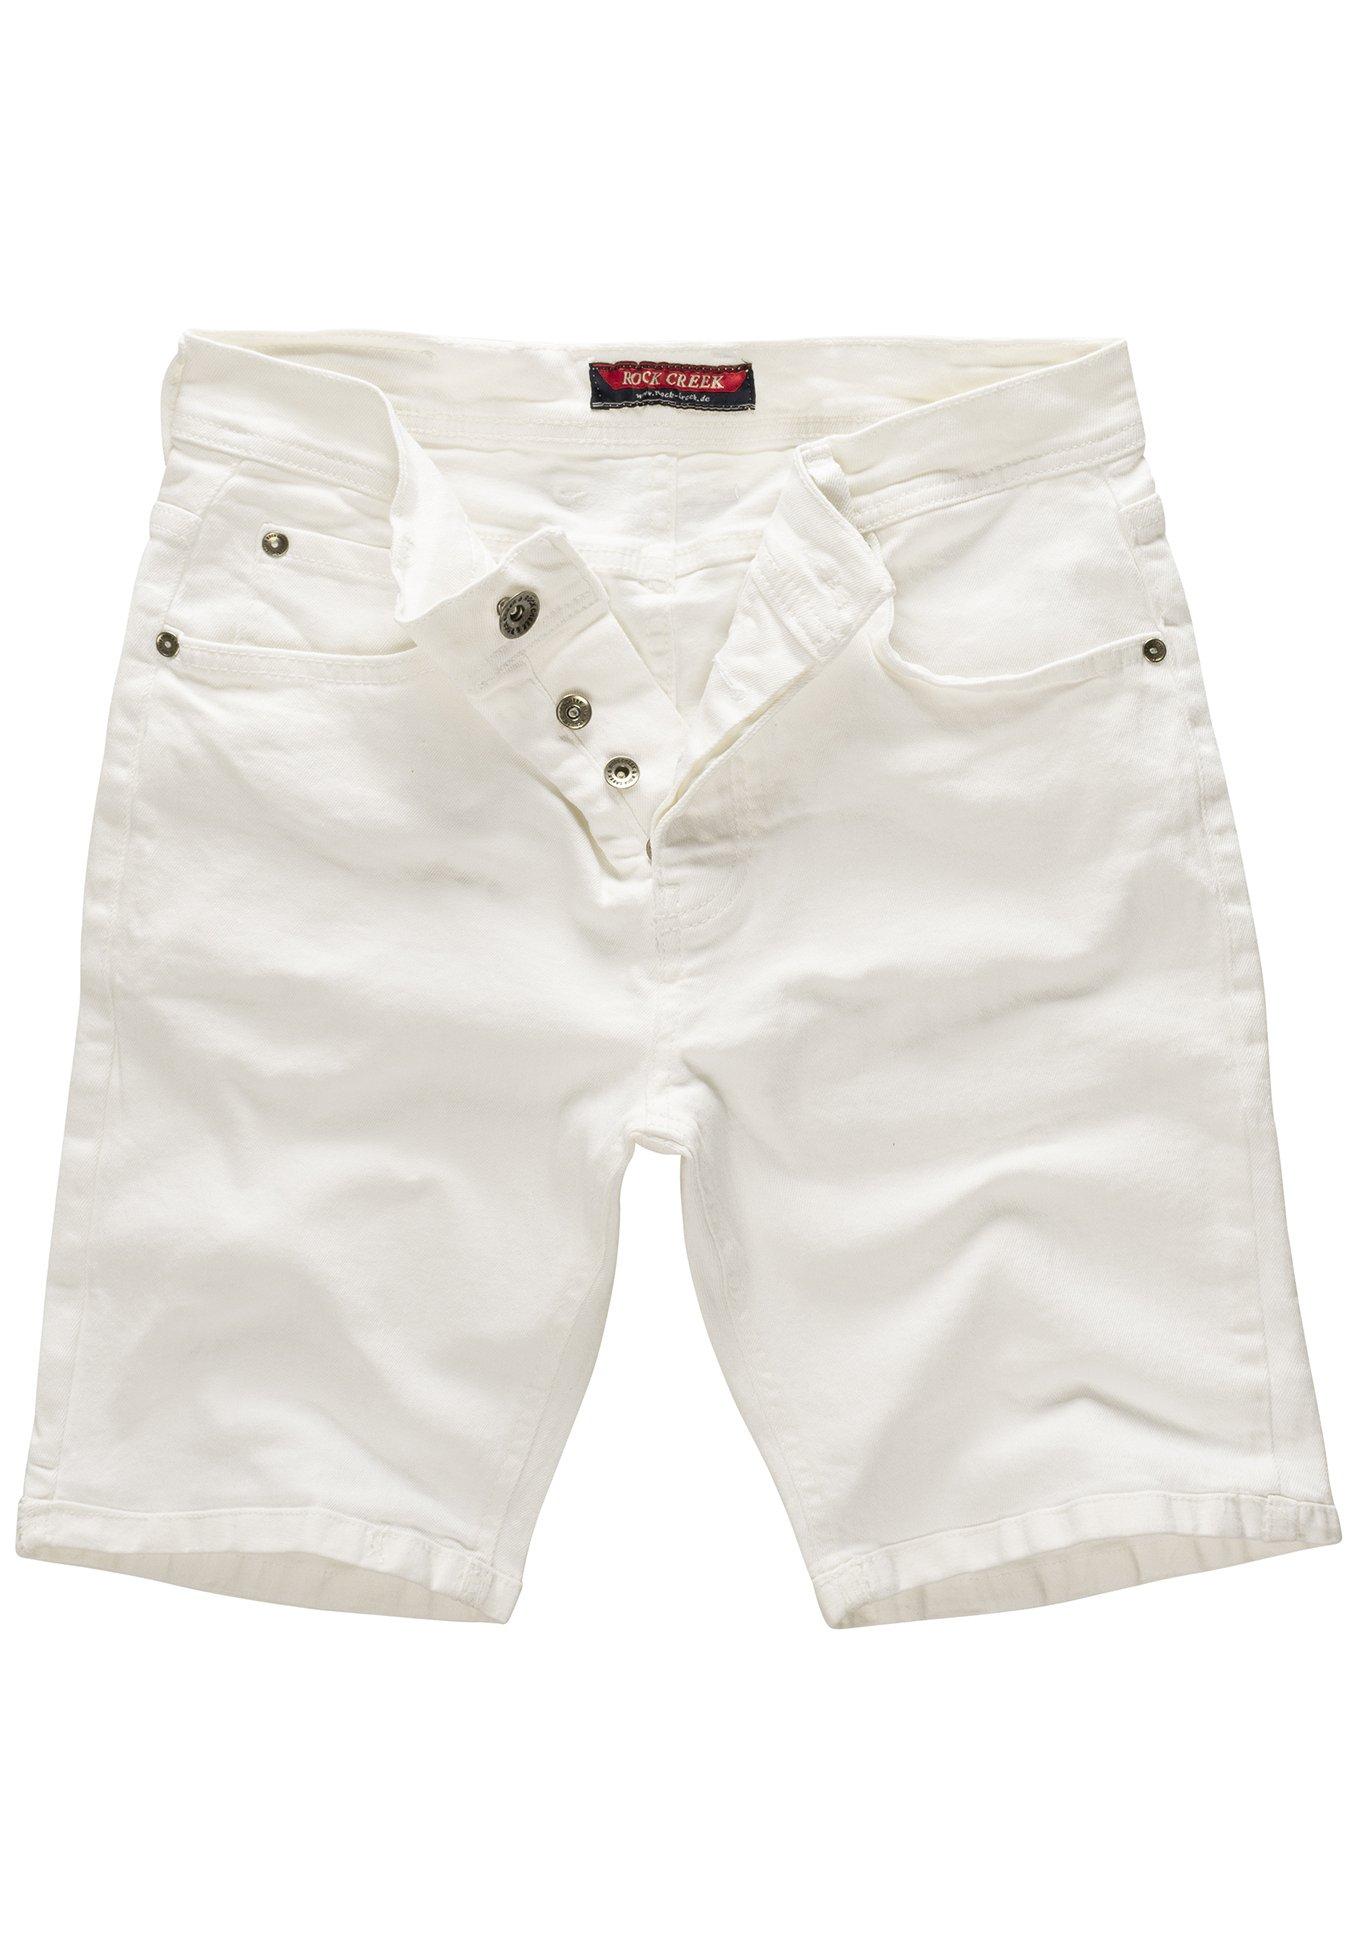 Herren SHORTS JEANS SHORTS  - Jeans Shorts